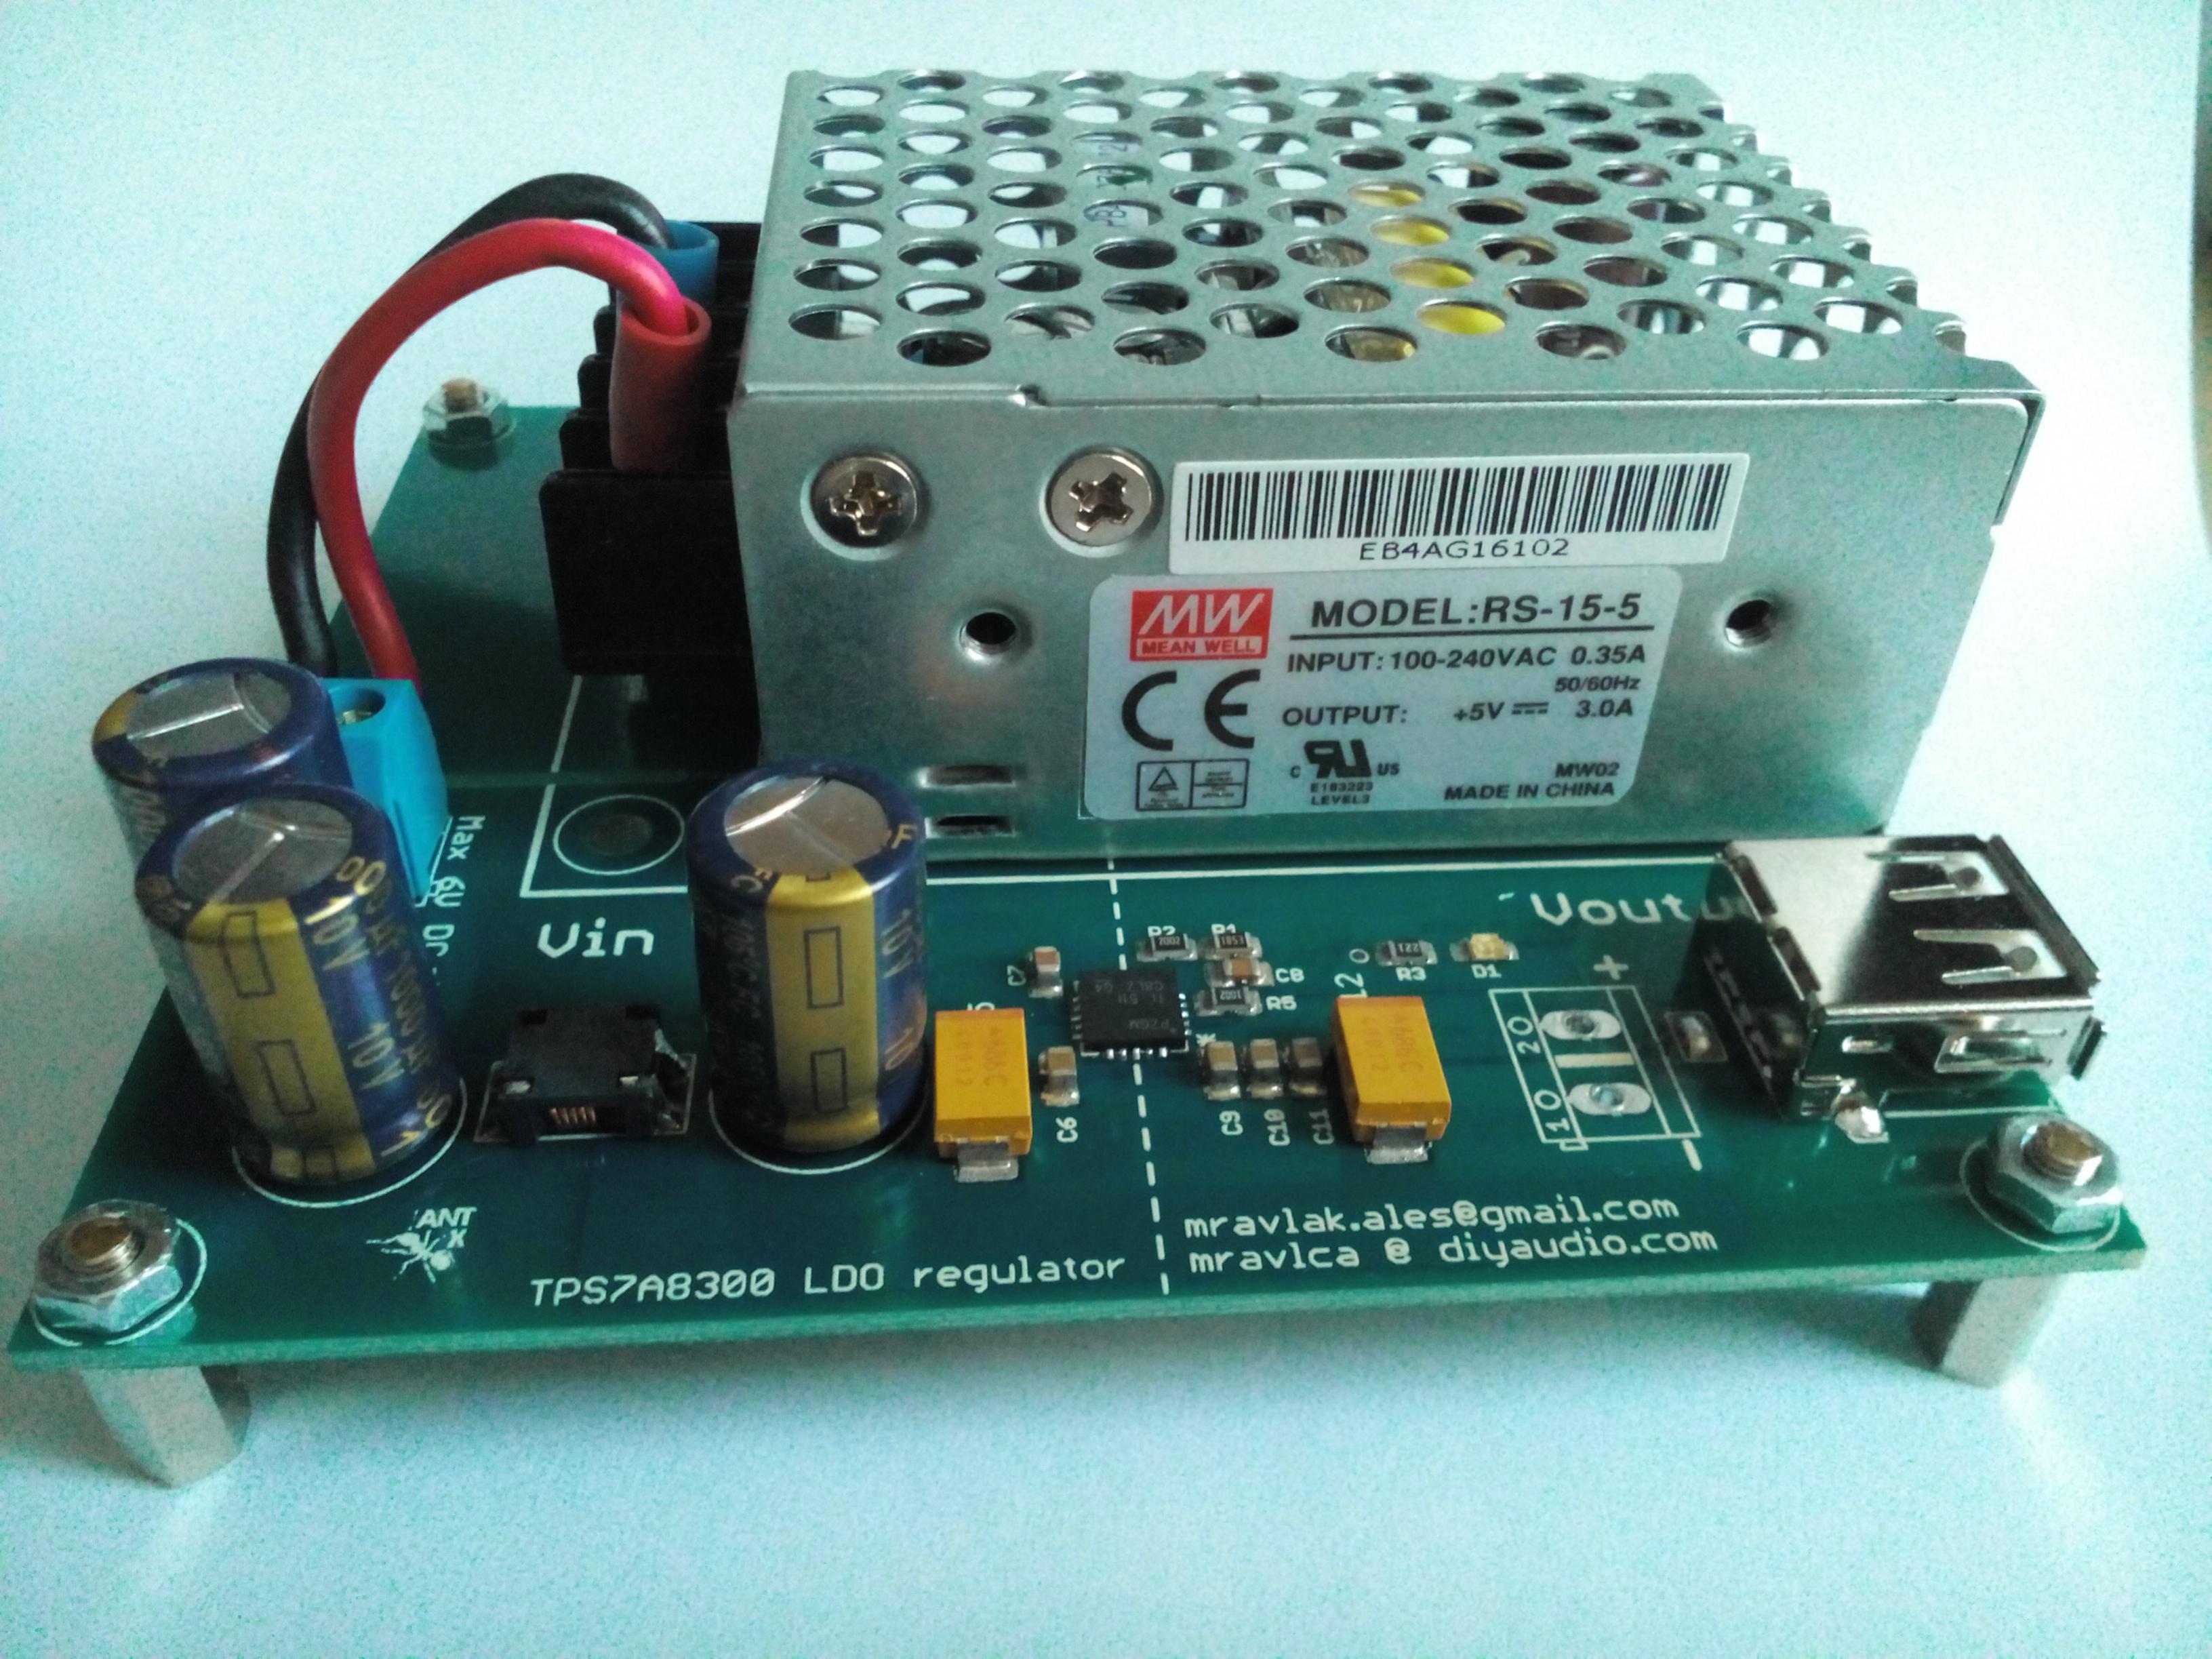 http://www.diyaudio.com/forums/attachments/power-supplies/479329d1429889693-raspberry-pi-psu-tps7a8300-5v-2a-img_20150424_171903.jpg